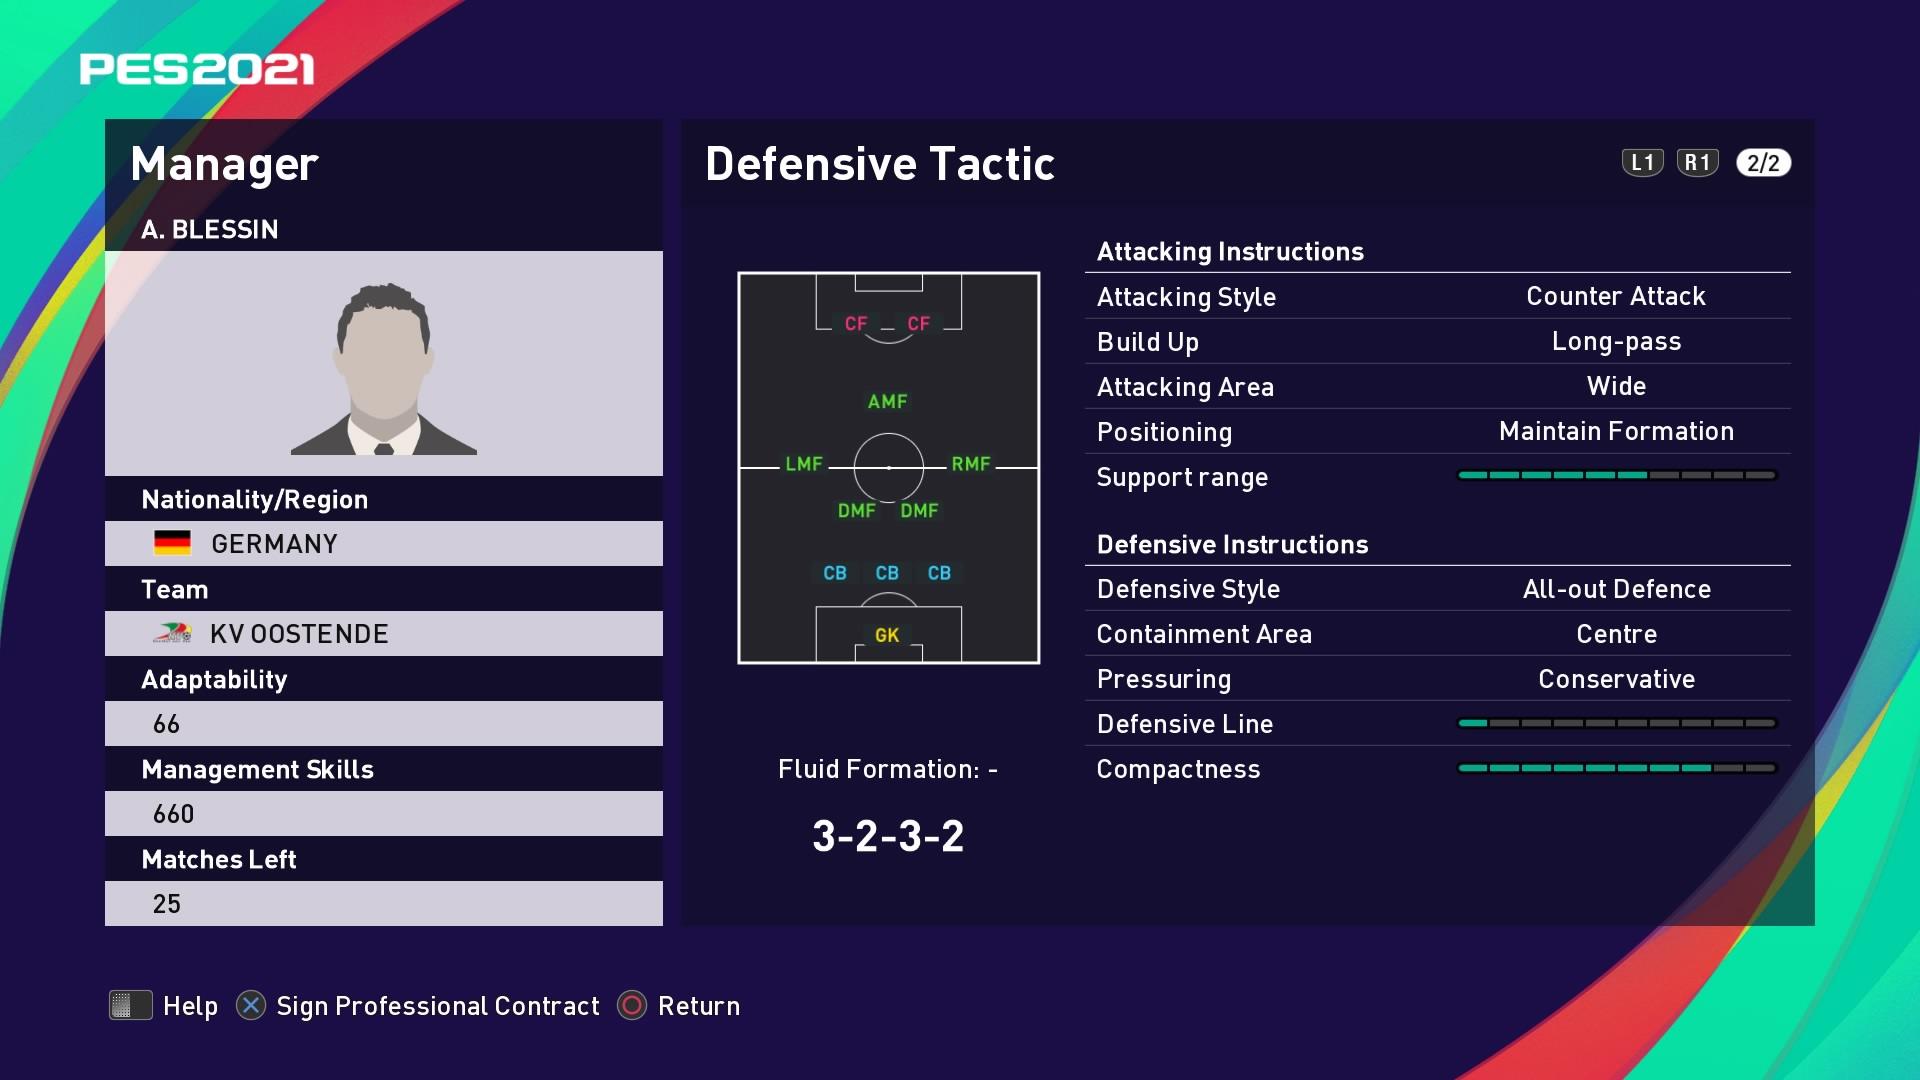 A. Blessin (Alexander Blessin) Defensive Tactic in PES 2021 myClub